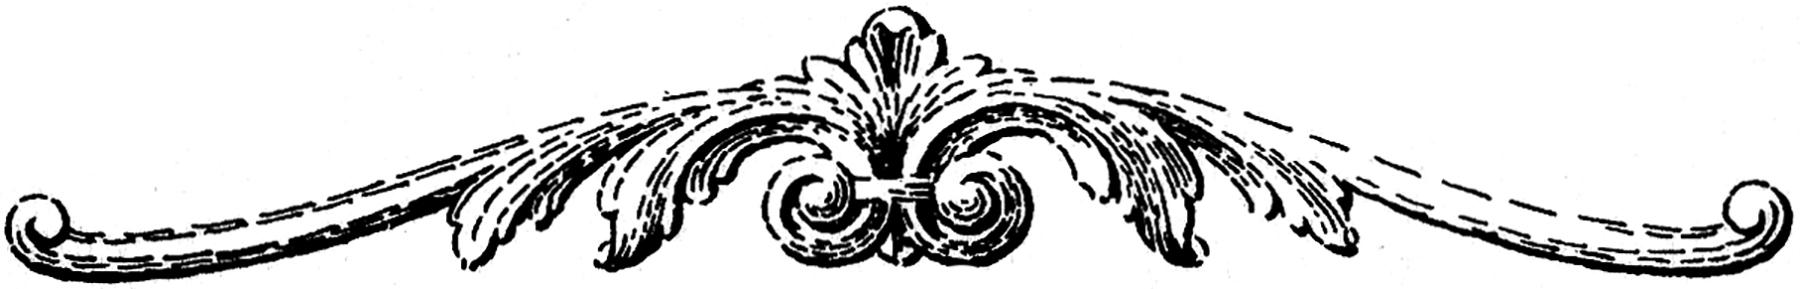 Black and White Molding Clip Art